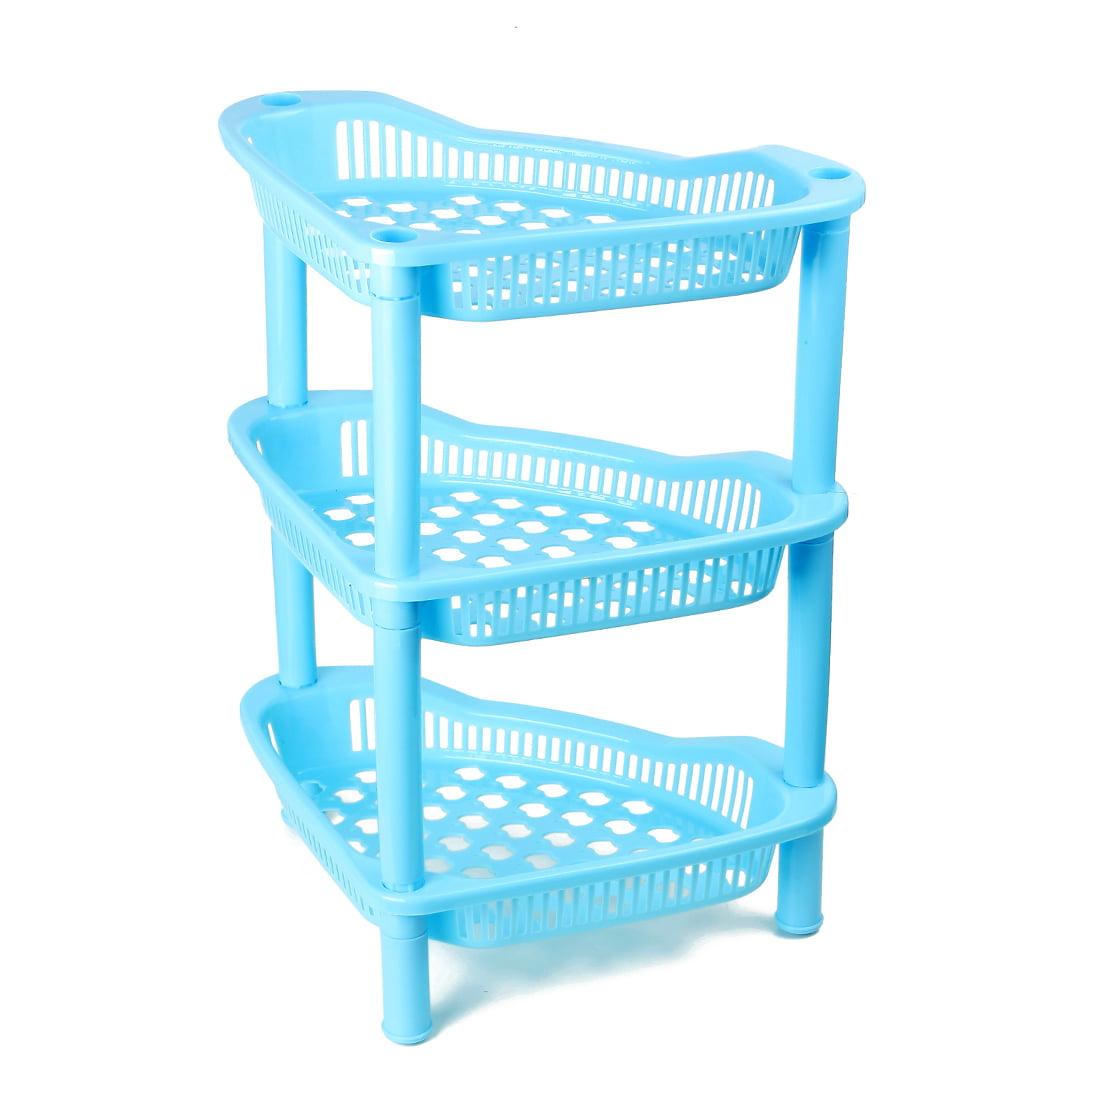 Home Bathroom Kitchen Blue Plastic 3 Layers Shelf Corner Storage Rack